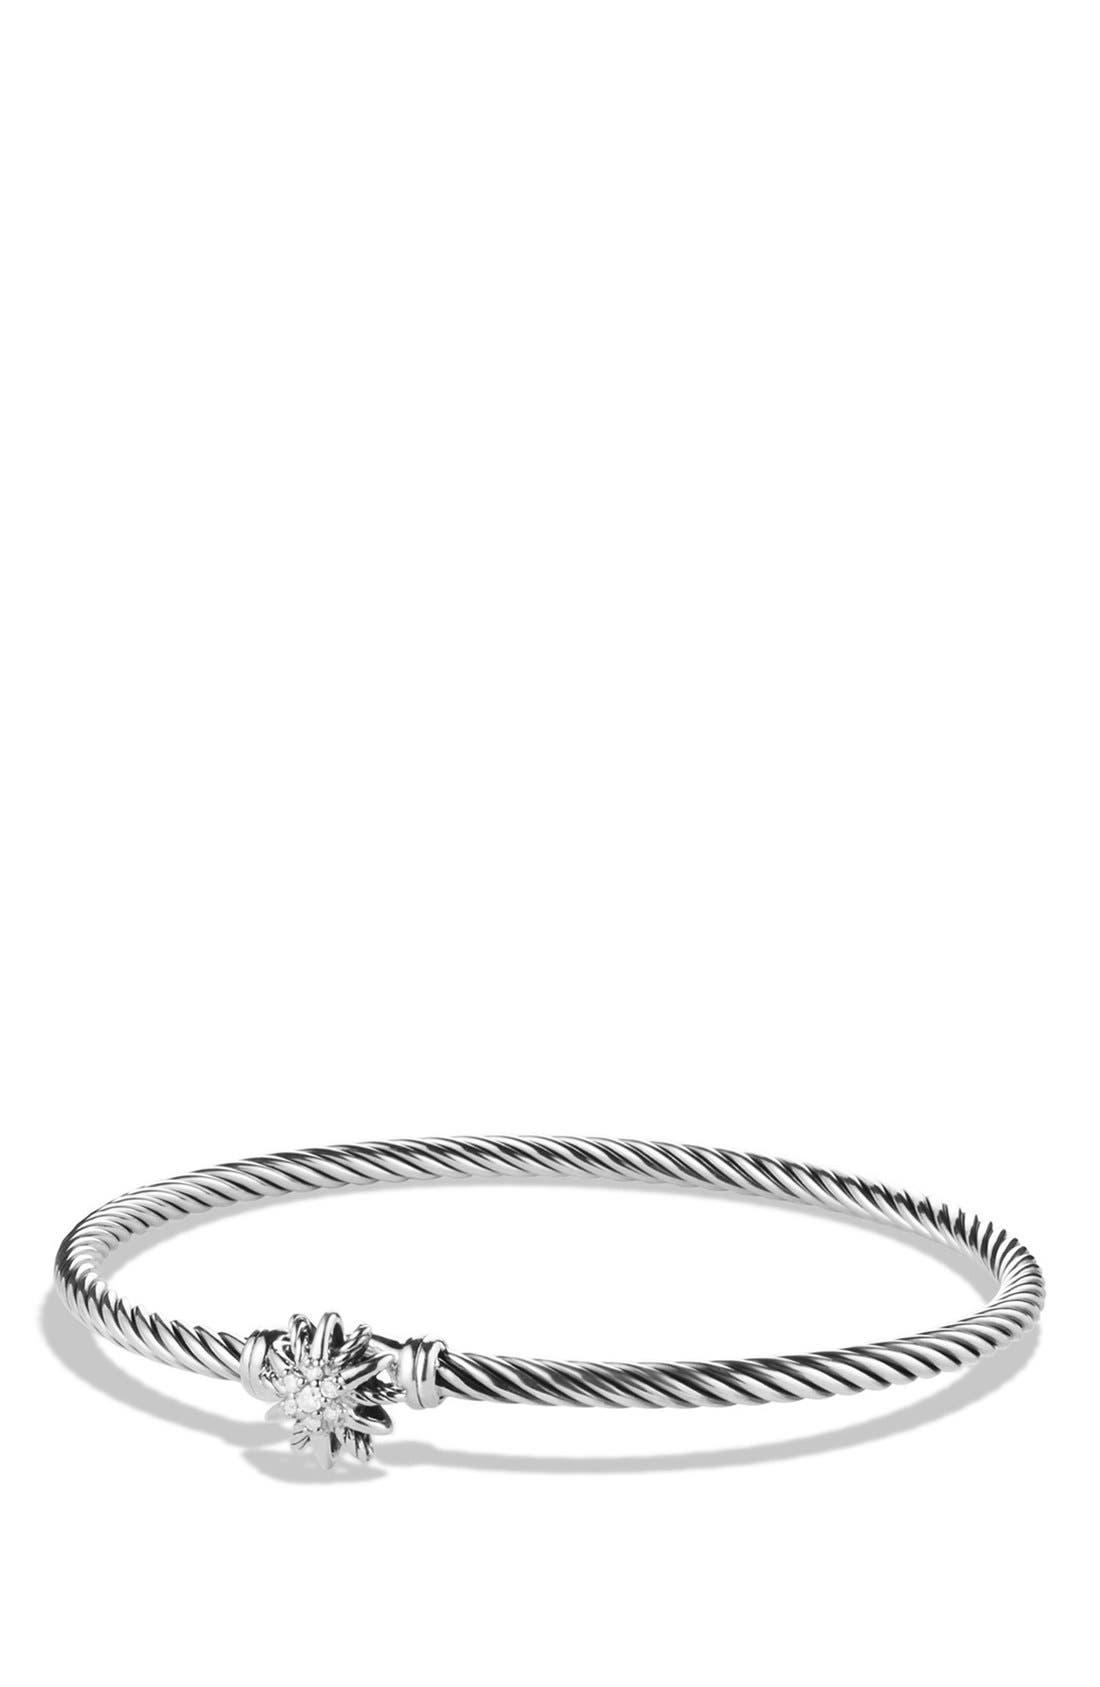 David Yurman 'Starburst' Single-Station Bracelet with Diamonds